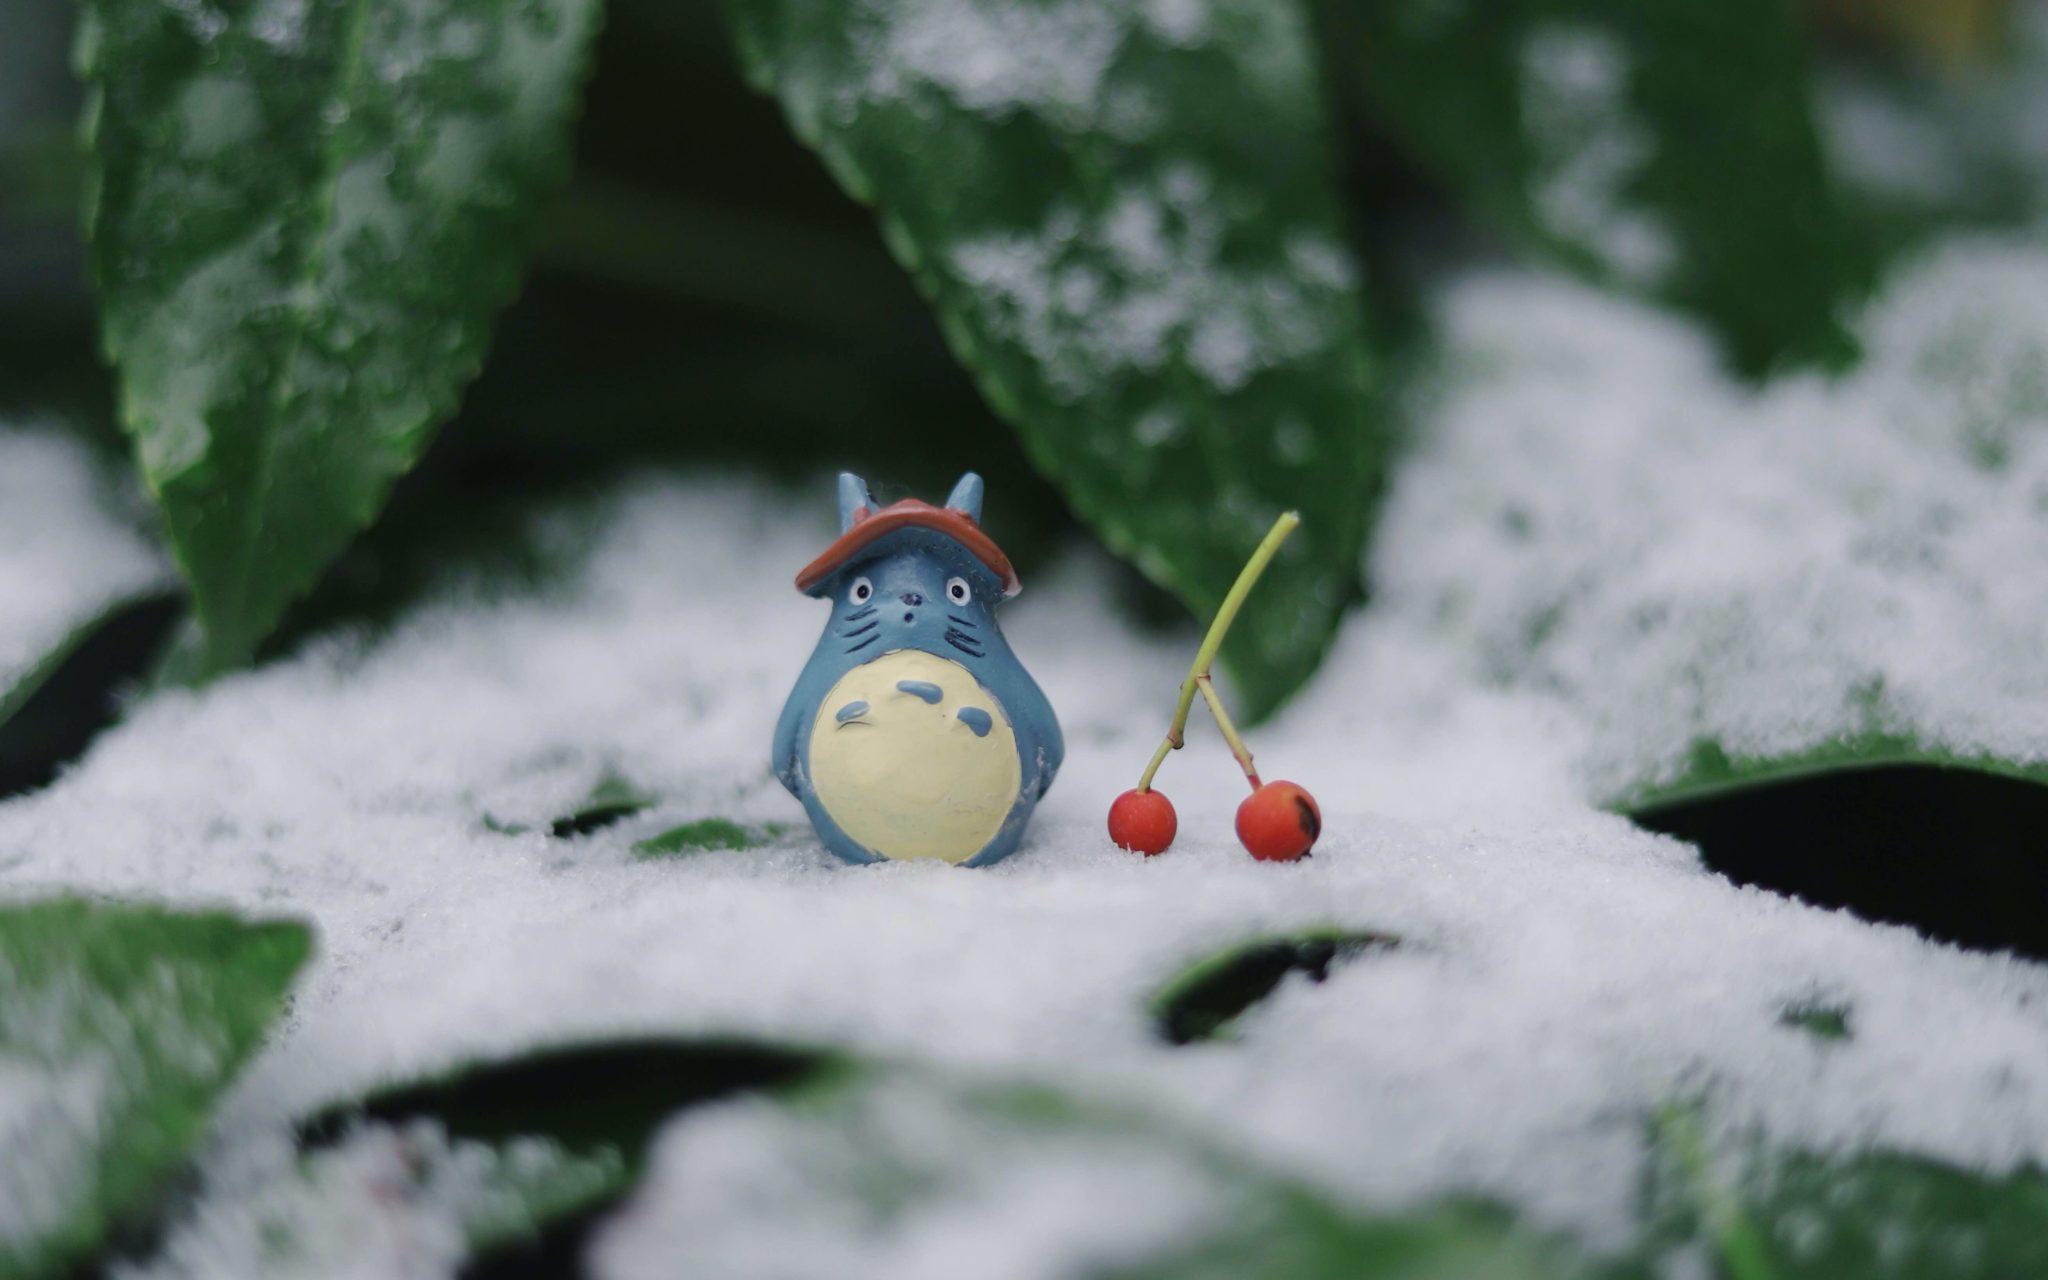 Totoro anime figure